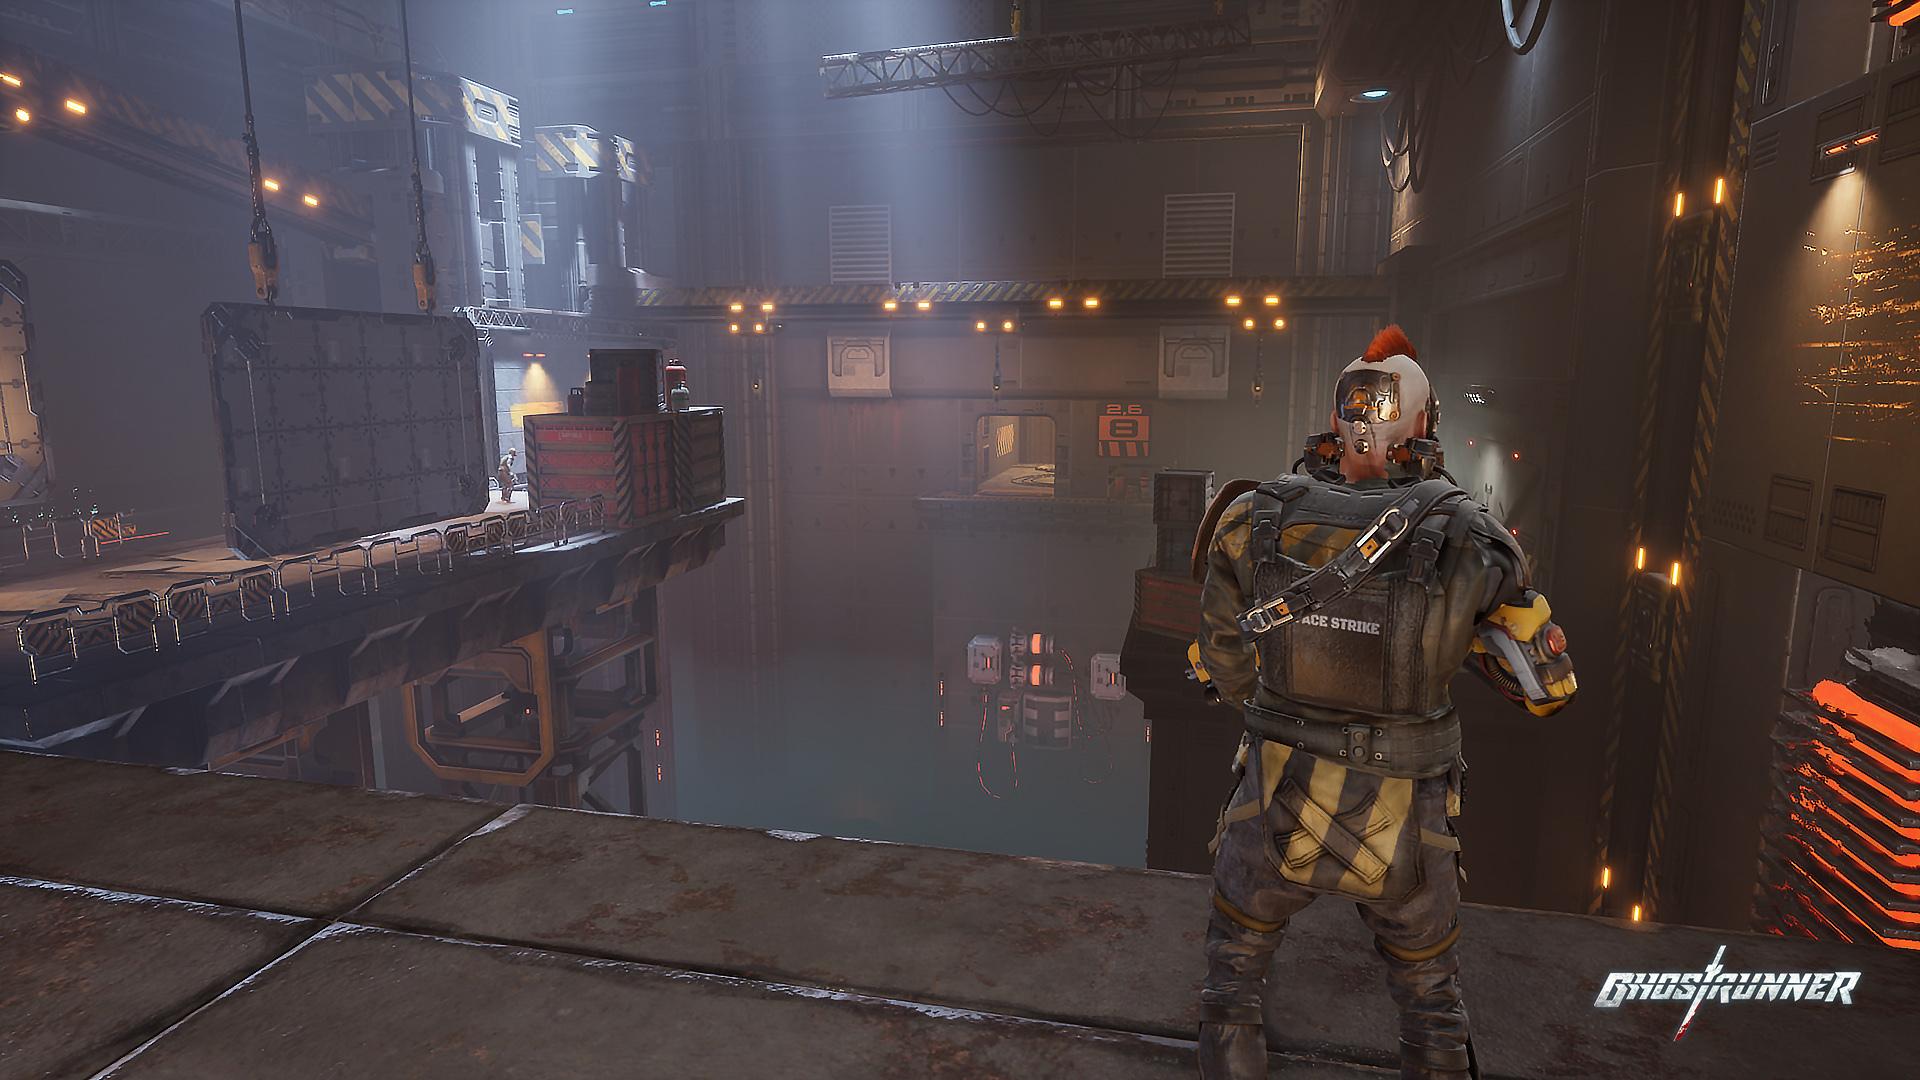 Ghostrunner [GOG] (2020) Скачать Лицензия